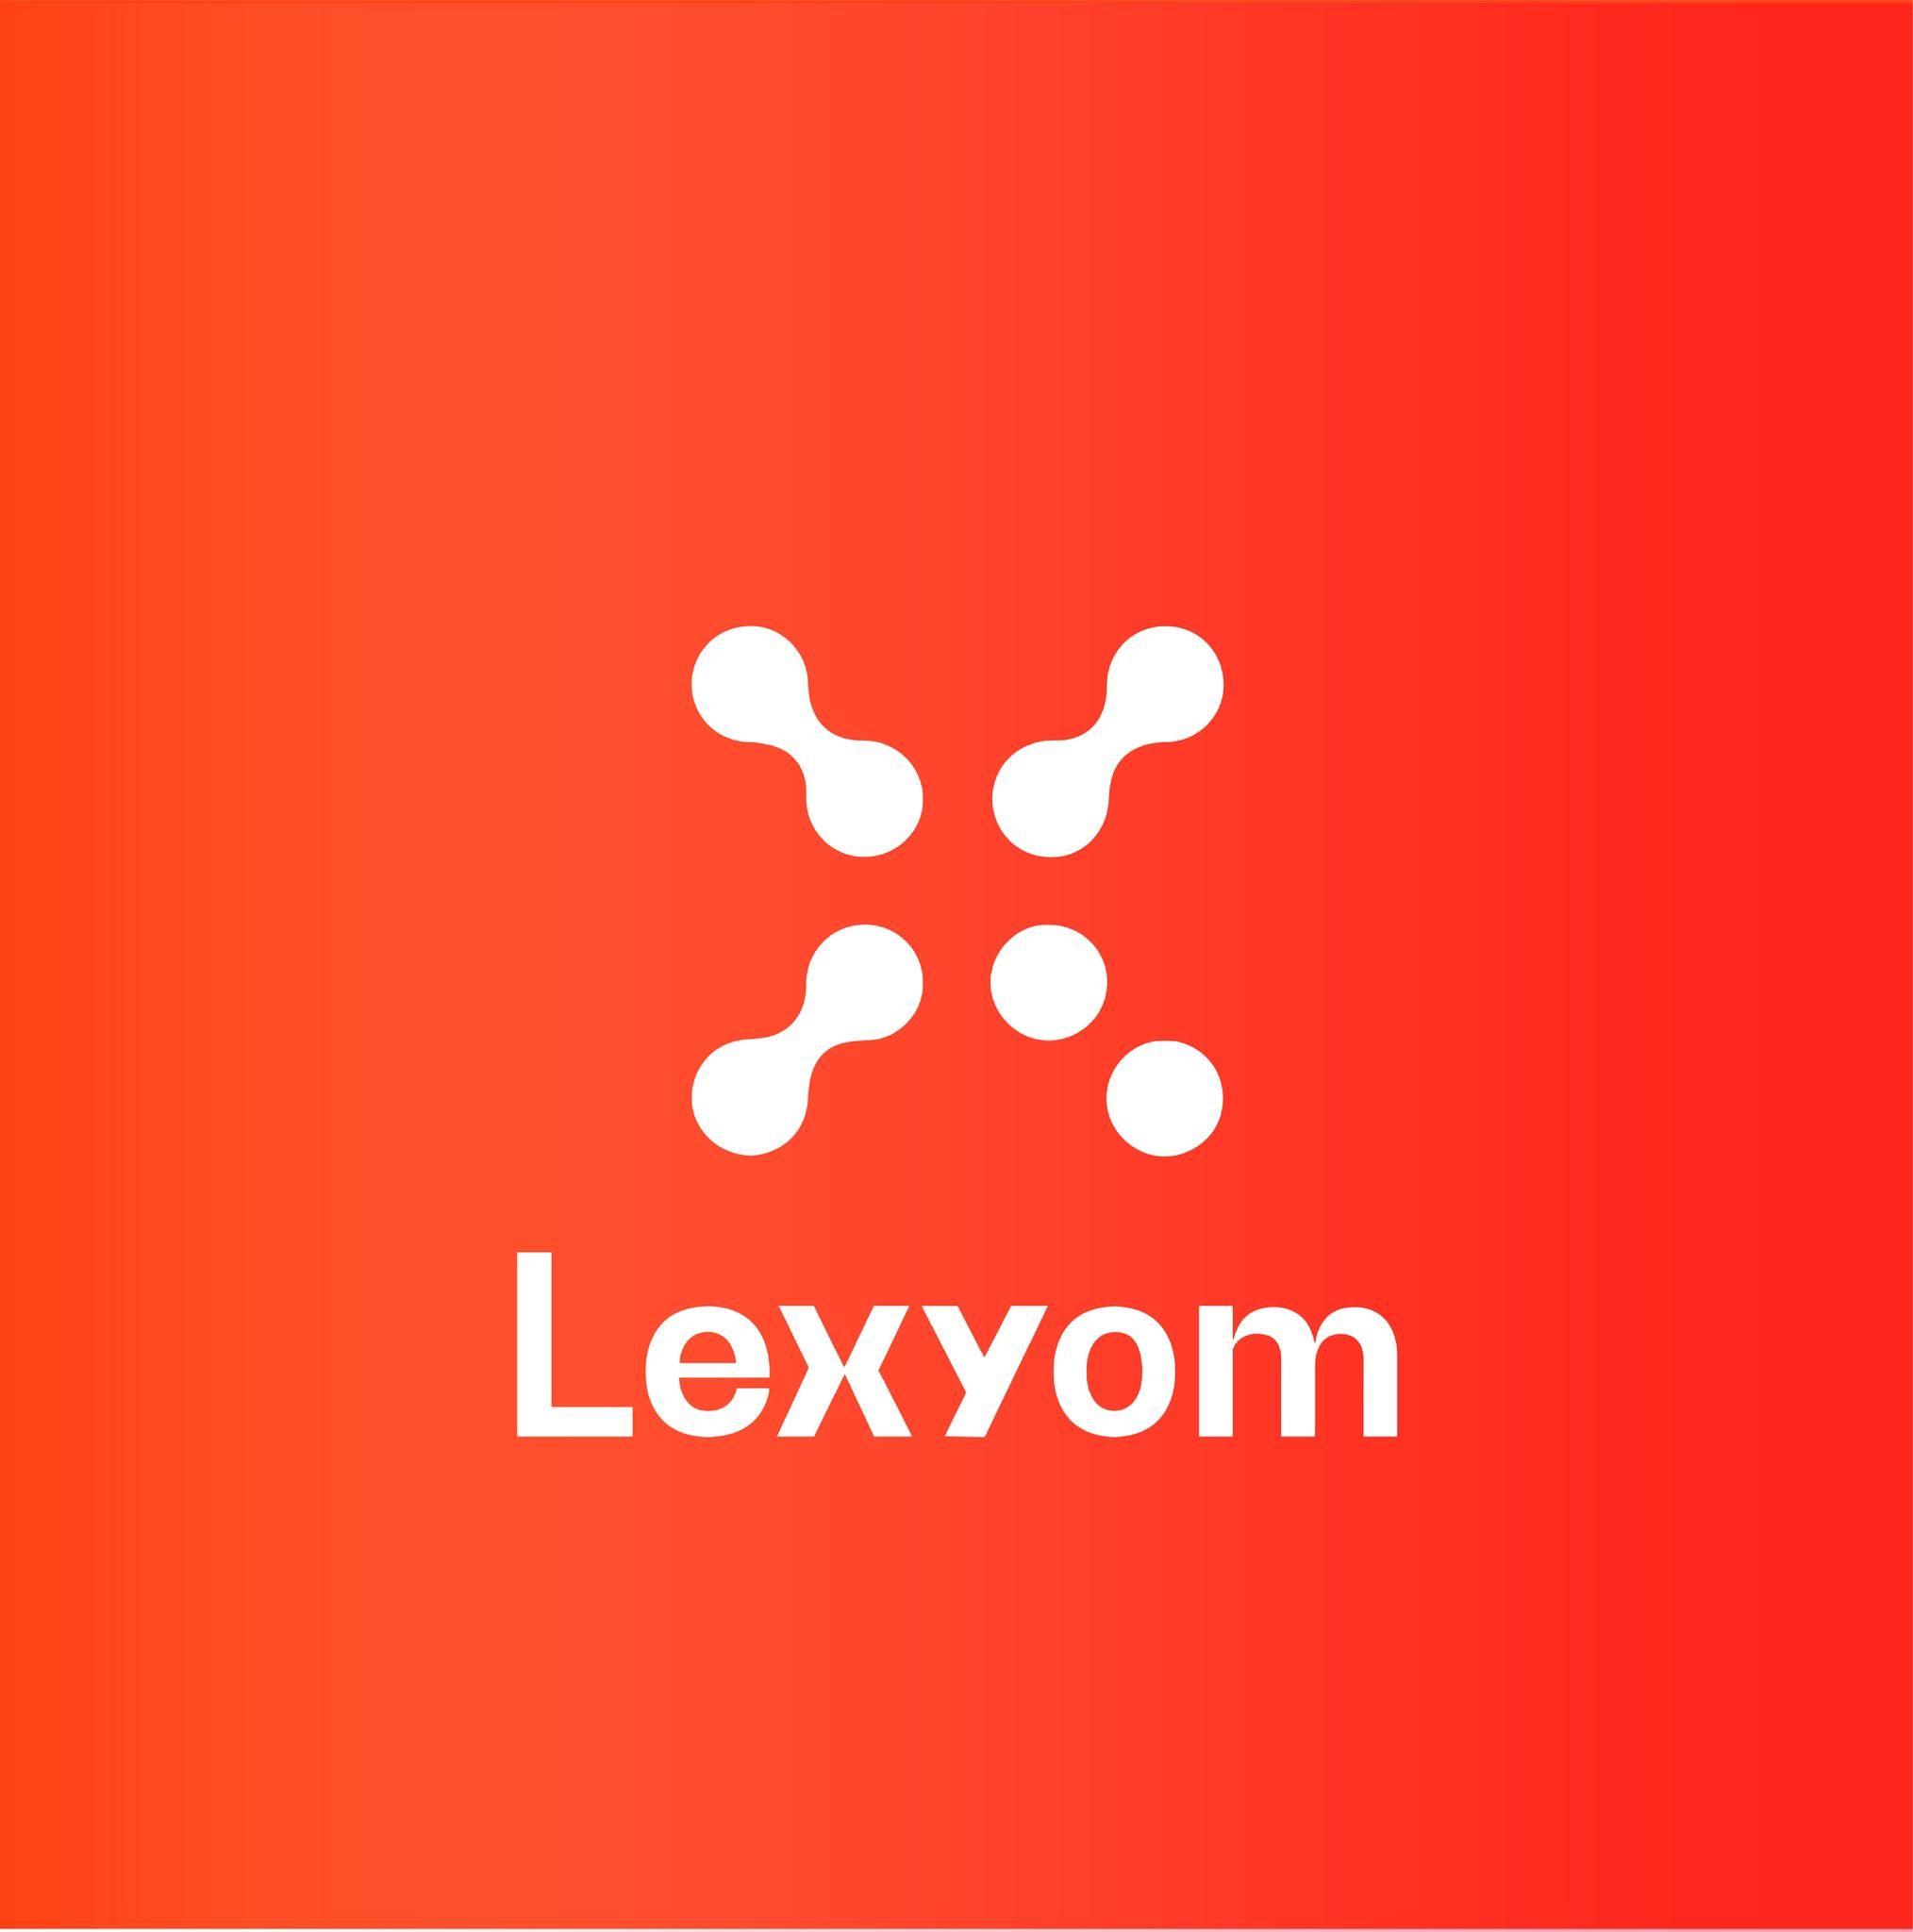 Lexyom, Inc. - LB